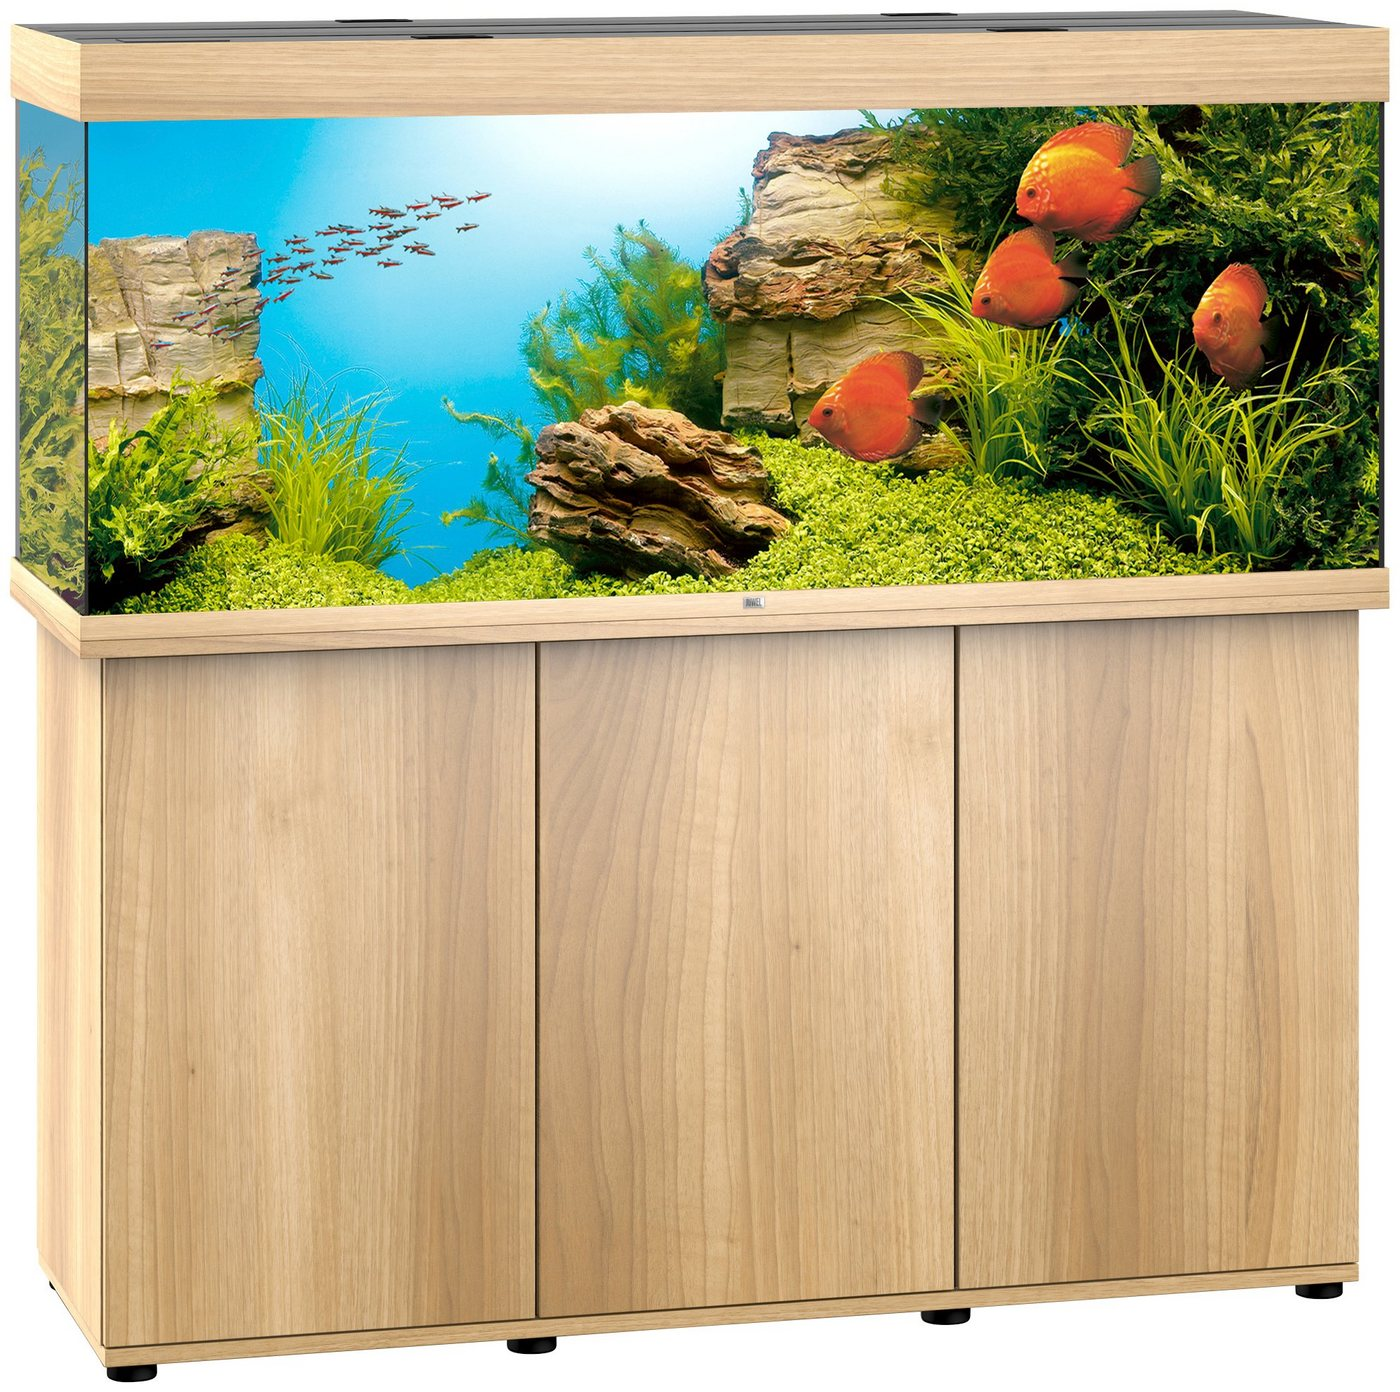 JUWEL AQUARIEN Aquarien-Set »Rio 450 LED«, B/T/H: 151/51/146 cm, 450 l, in 4 Farben - Preisvergleich